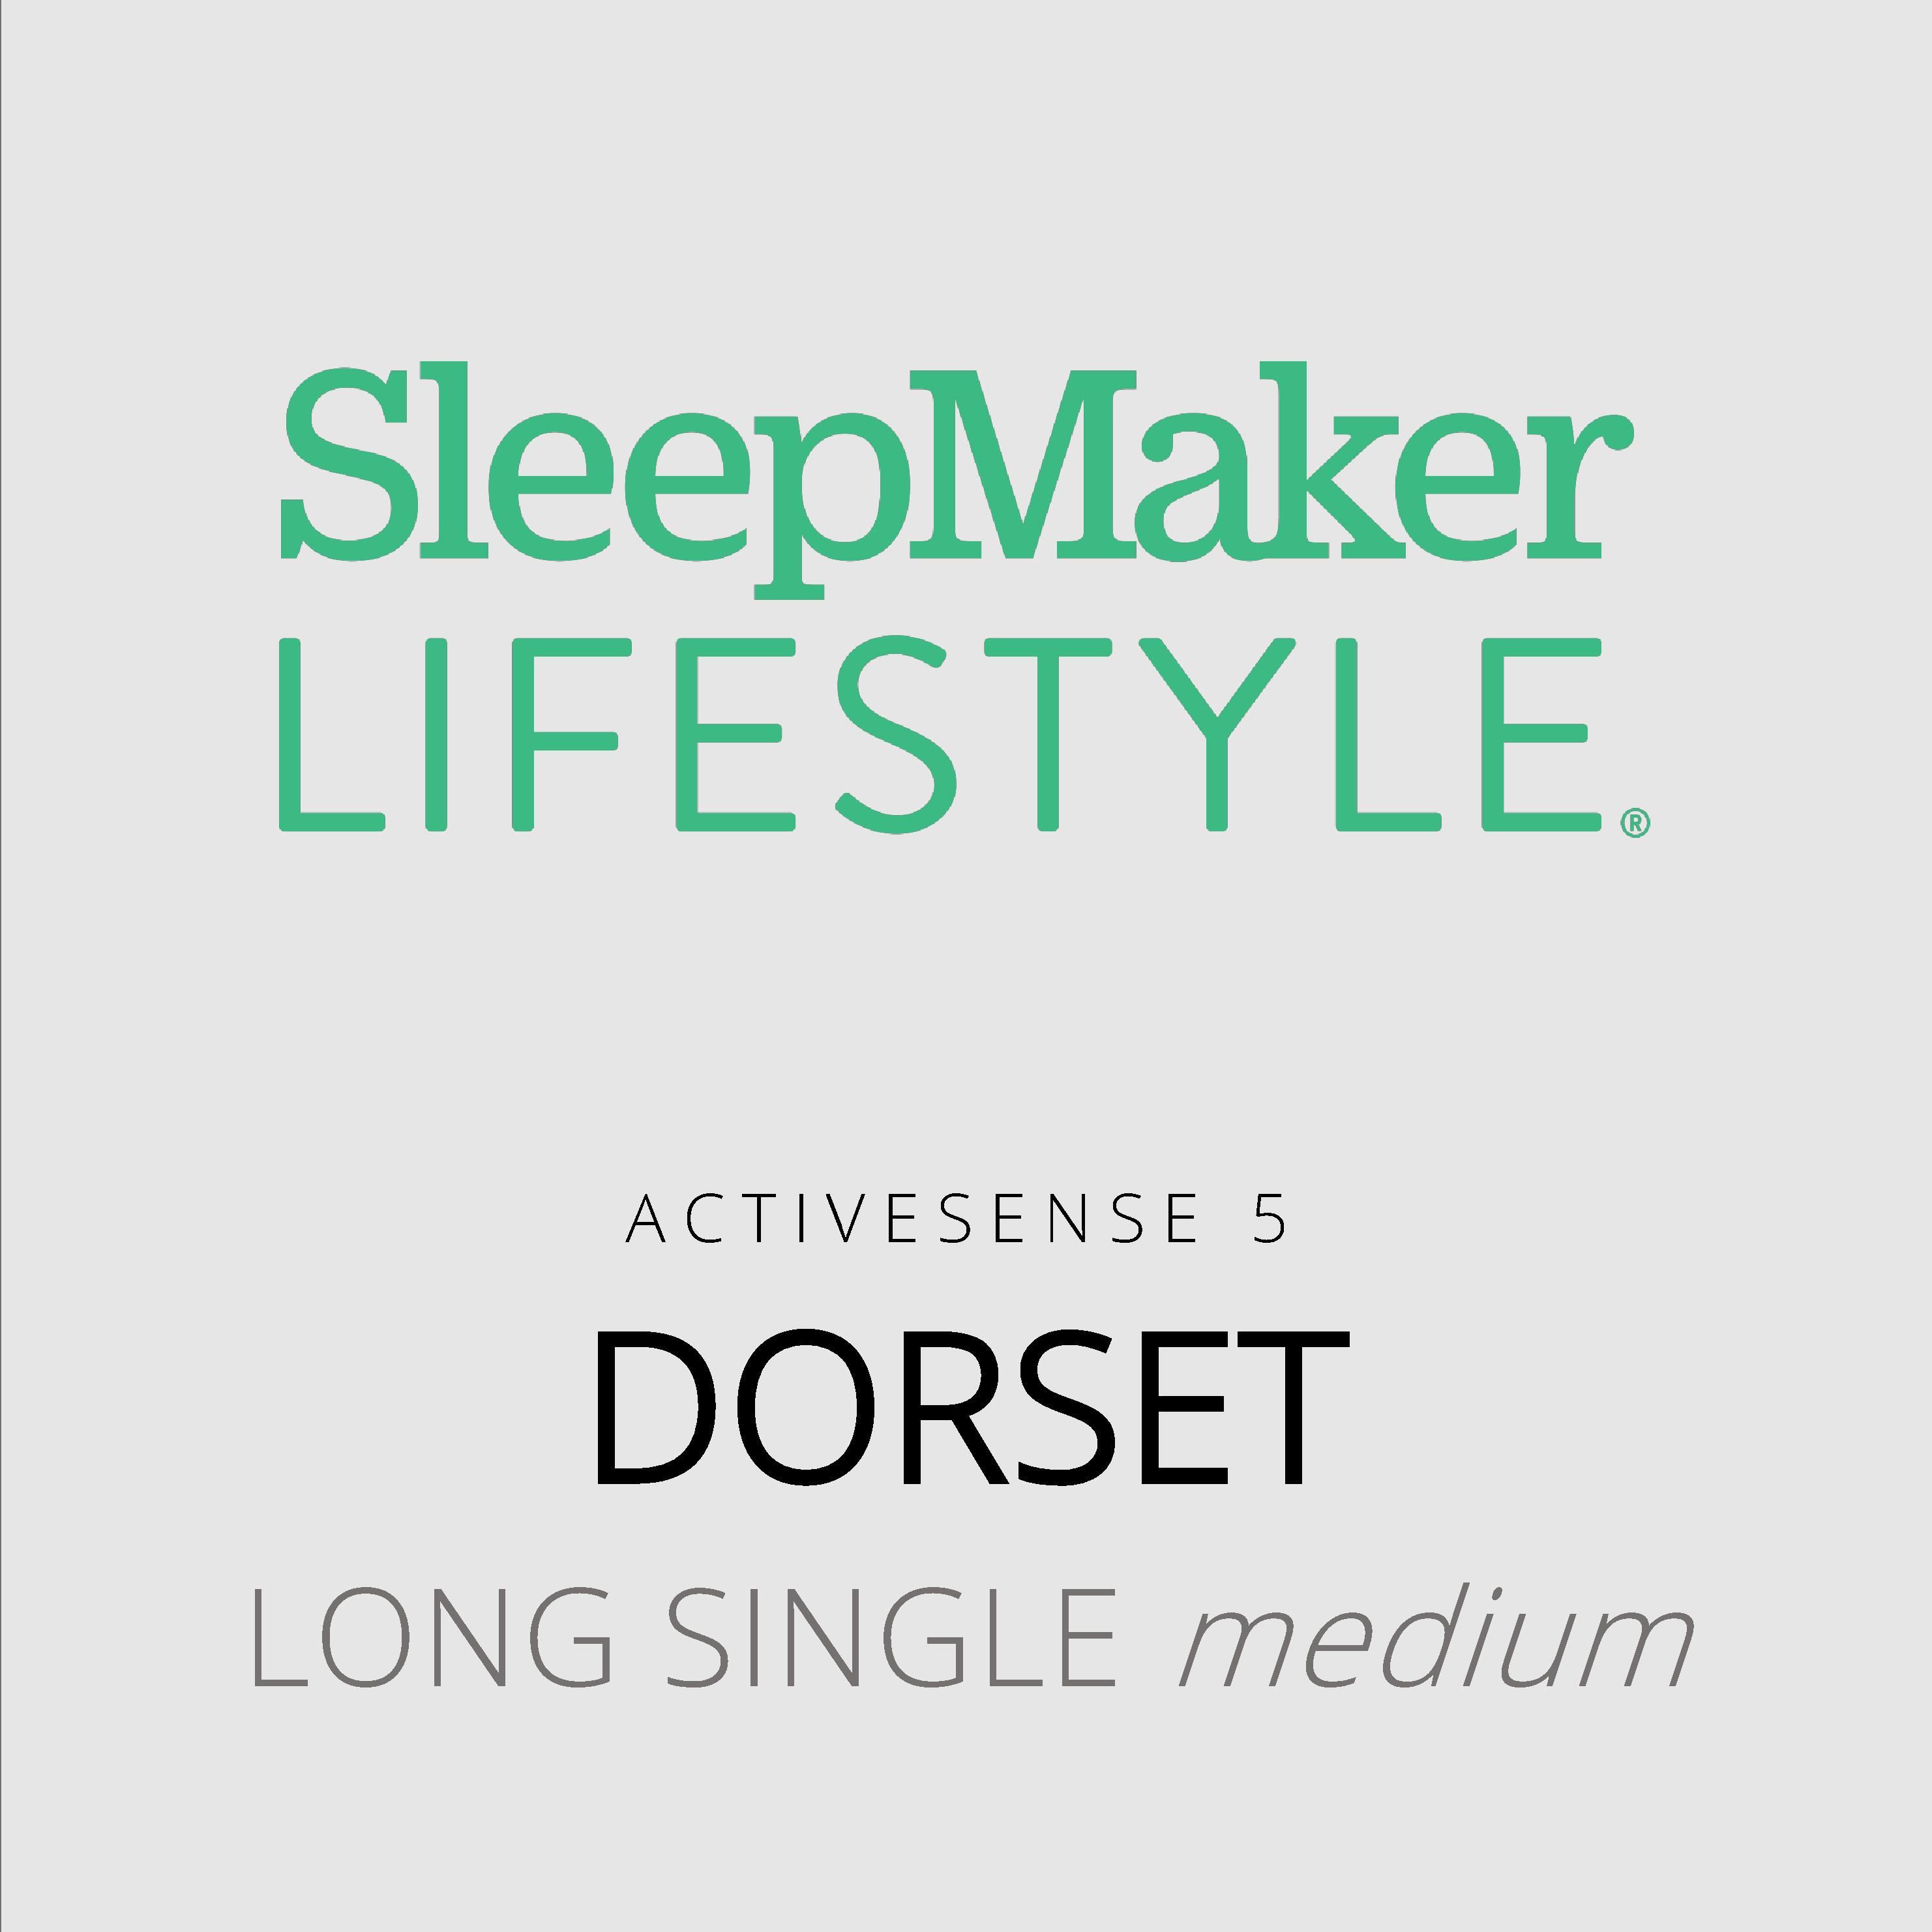 SleepMaker Lifestyle – Dorset – ActiveSense 5 – Long Single Medium Mattress